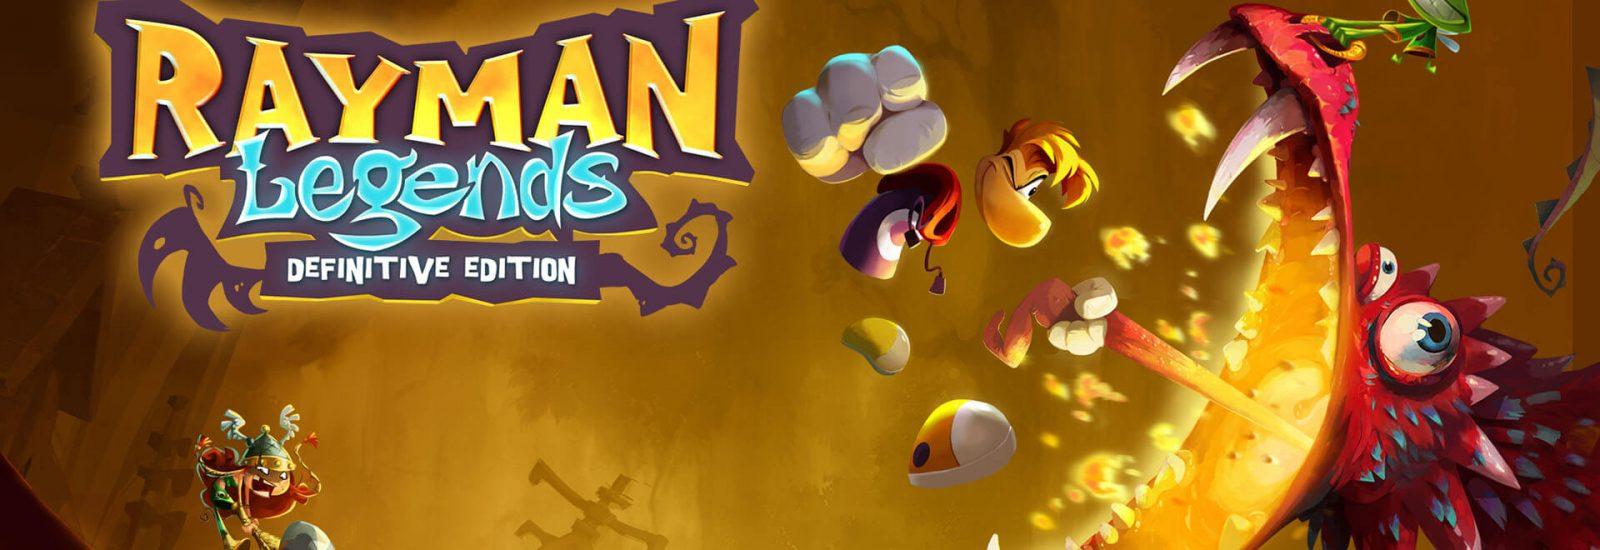 Rayman Legends Definitive Edition